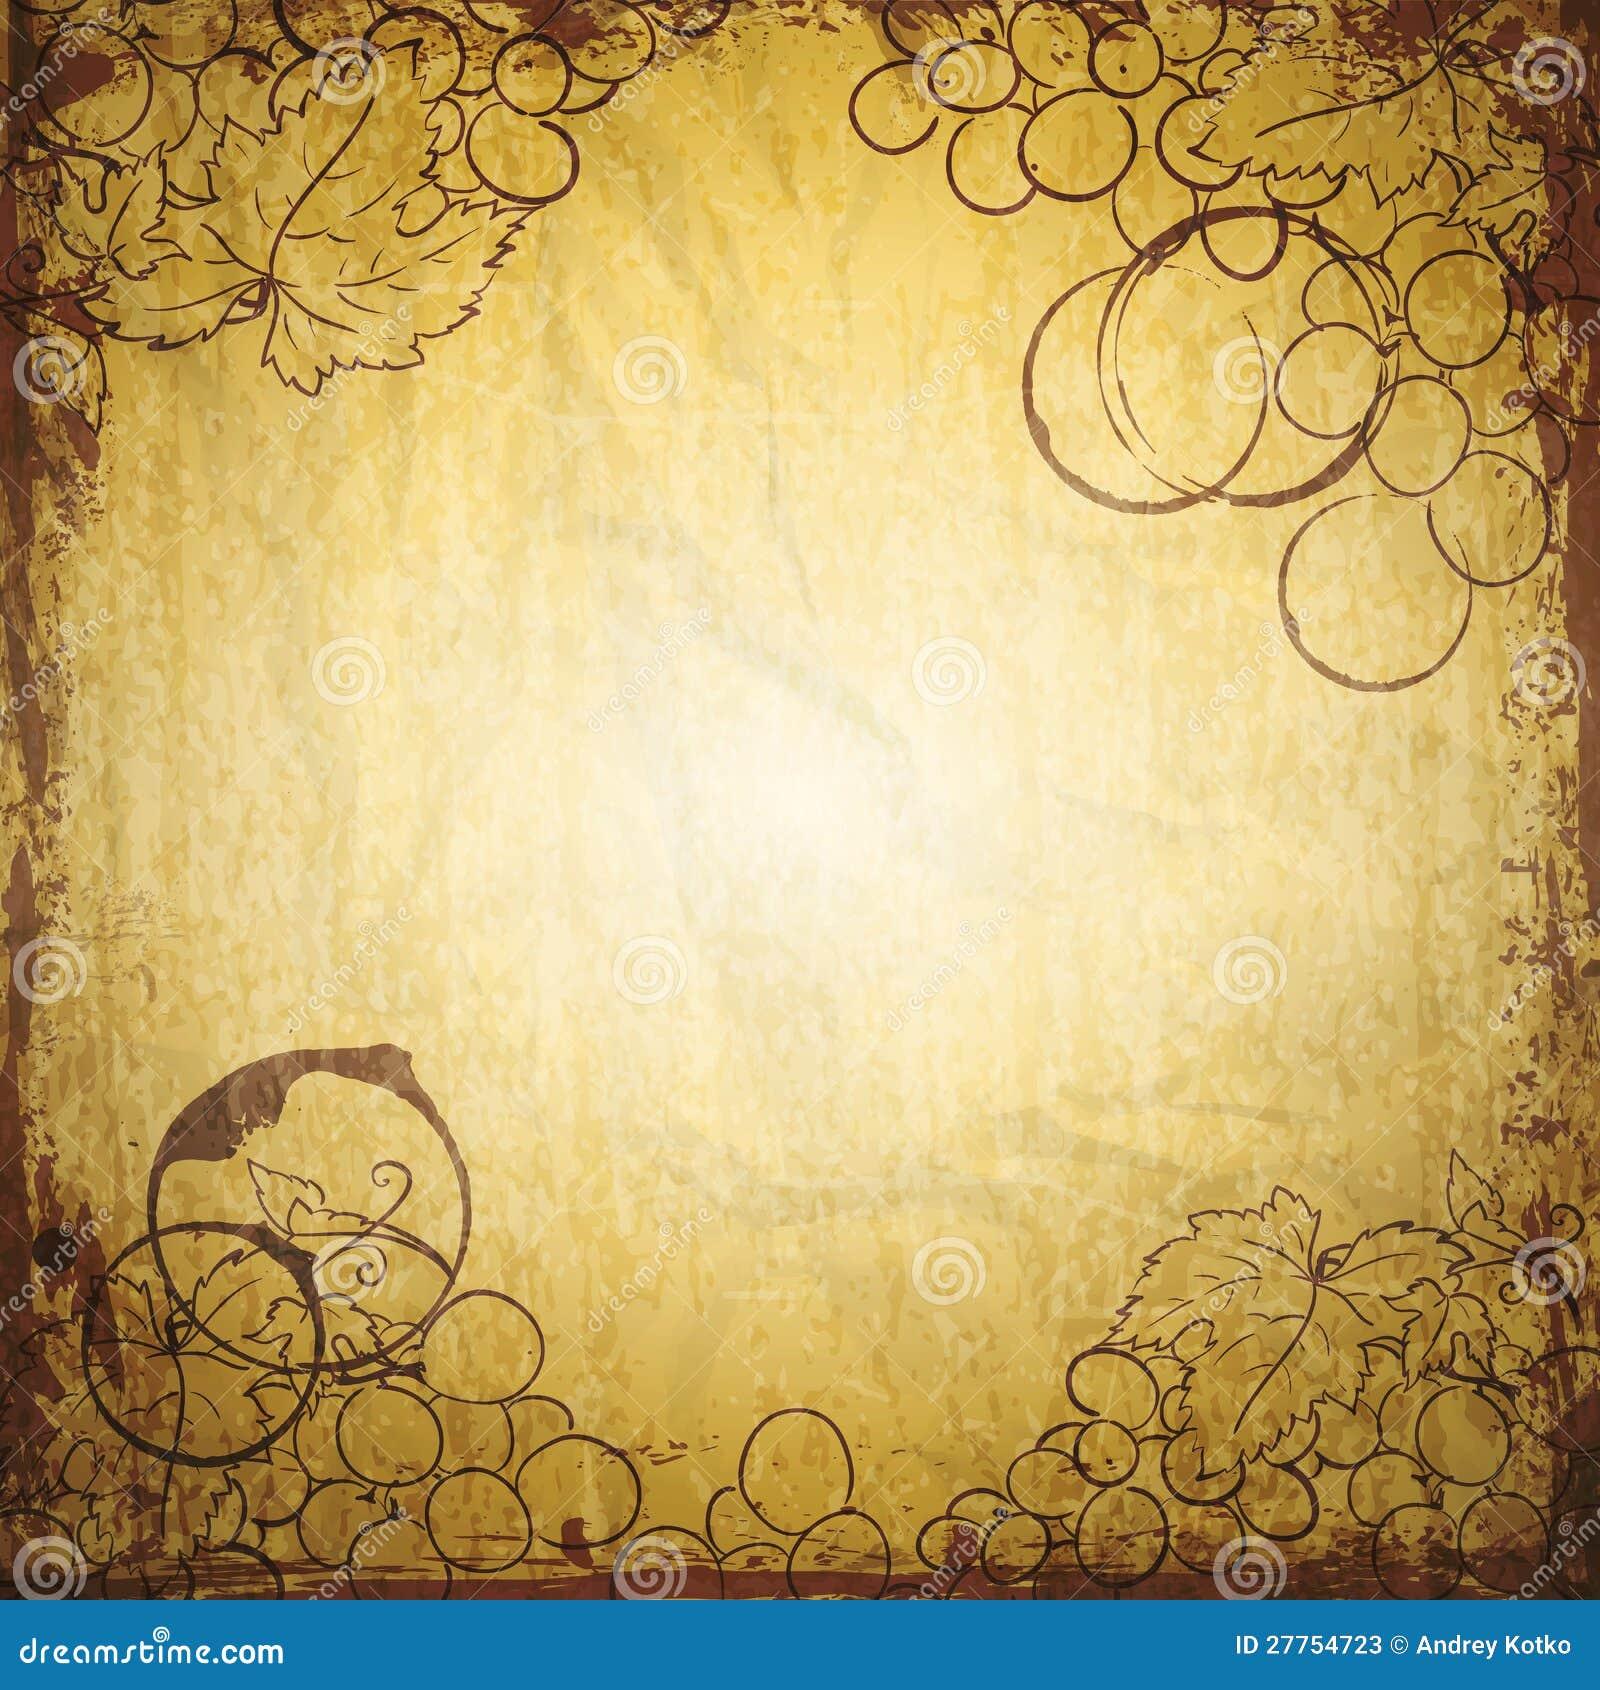 download the literary agamben adventures in logopoiesis